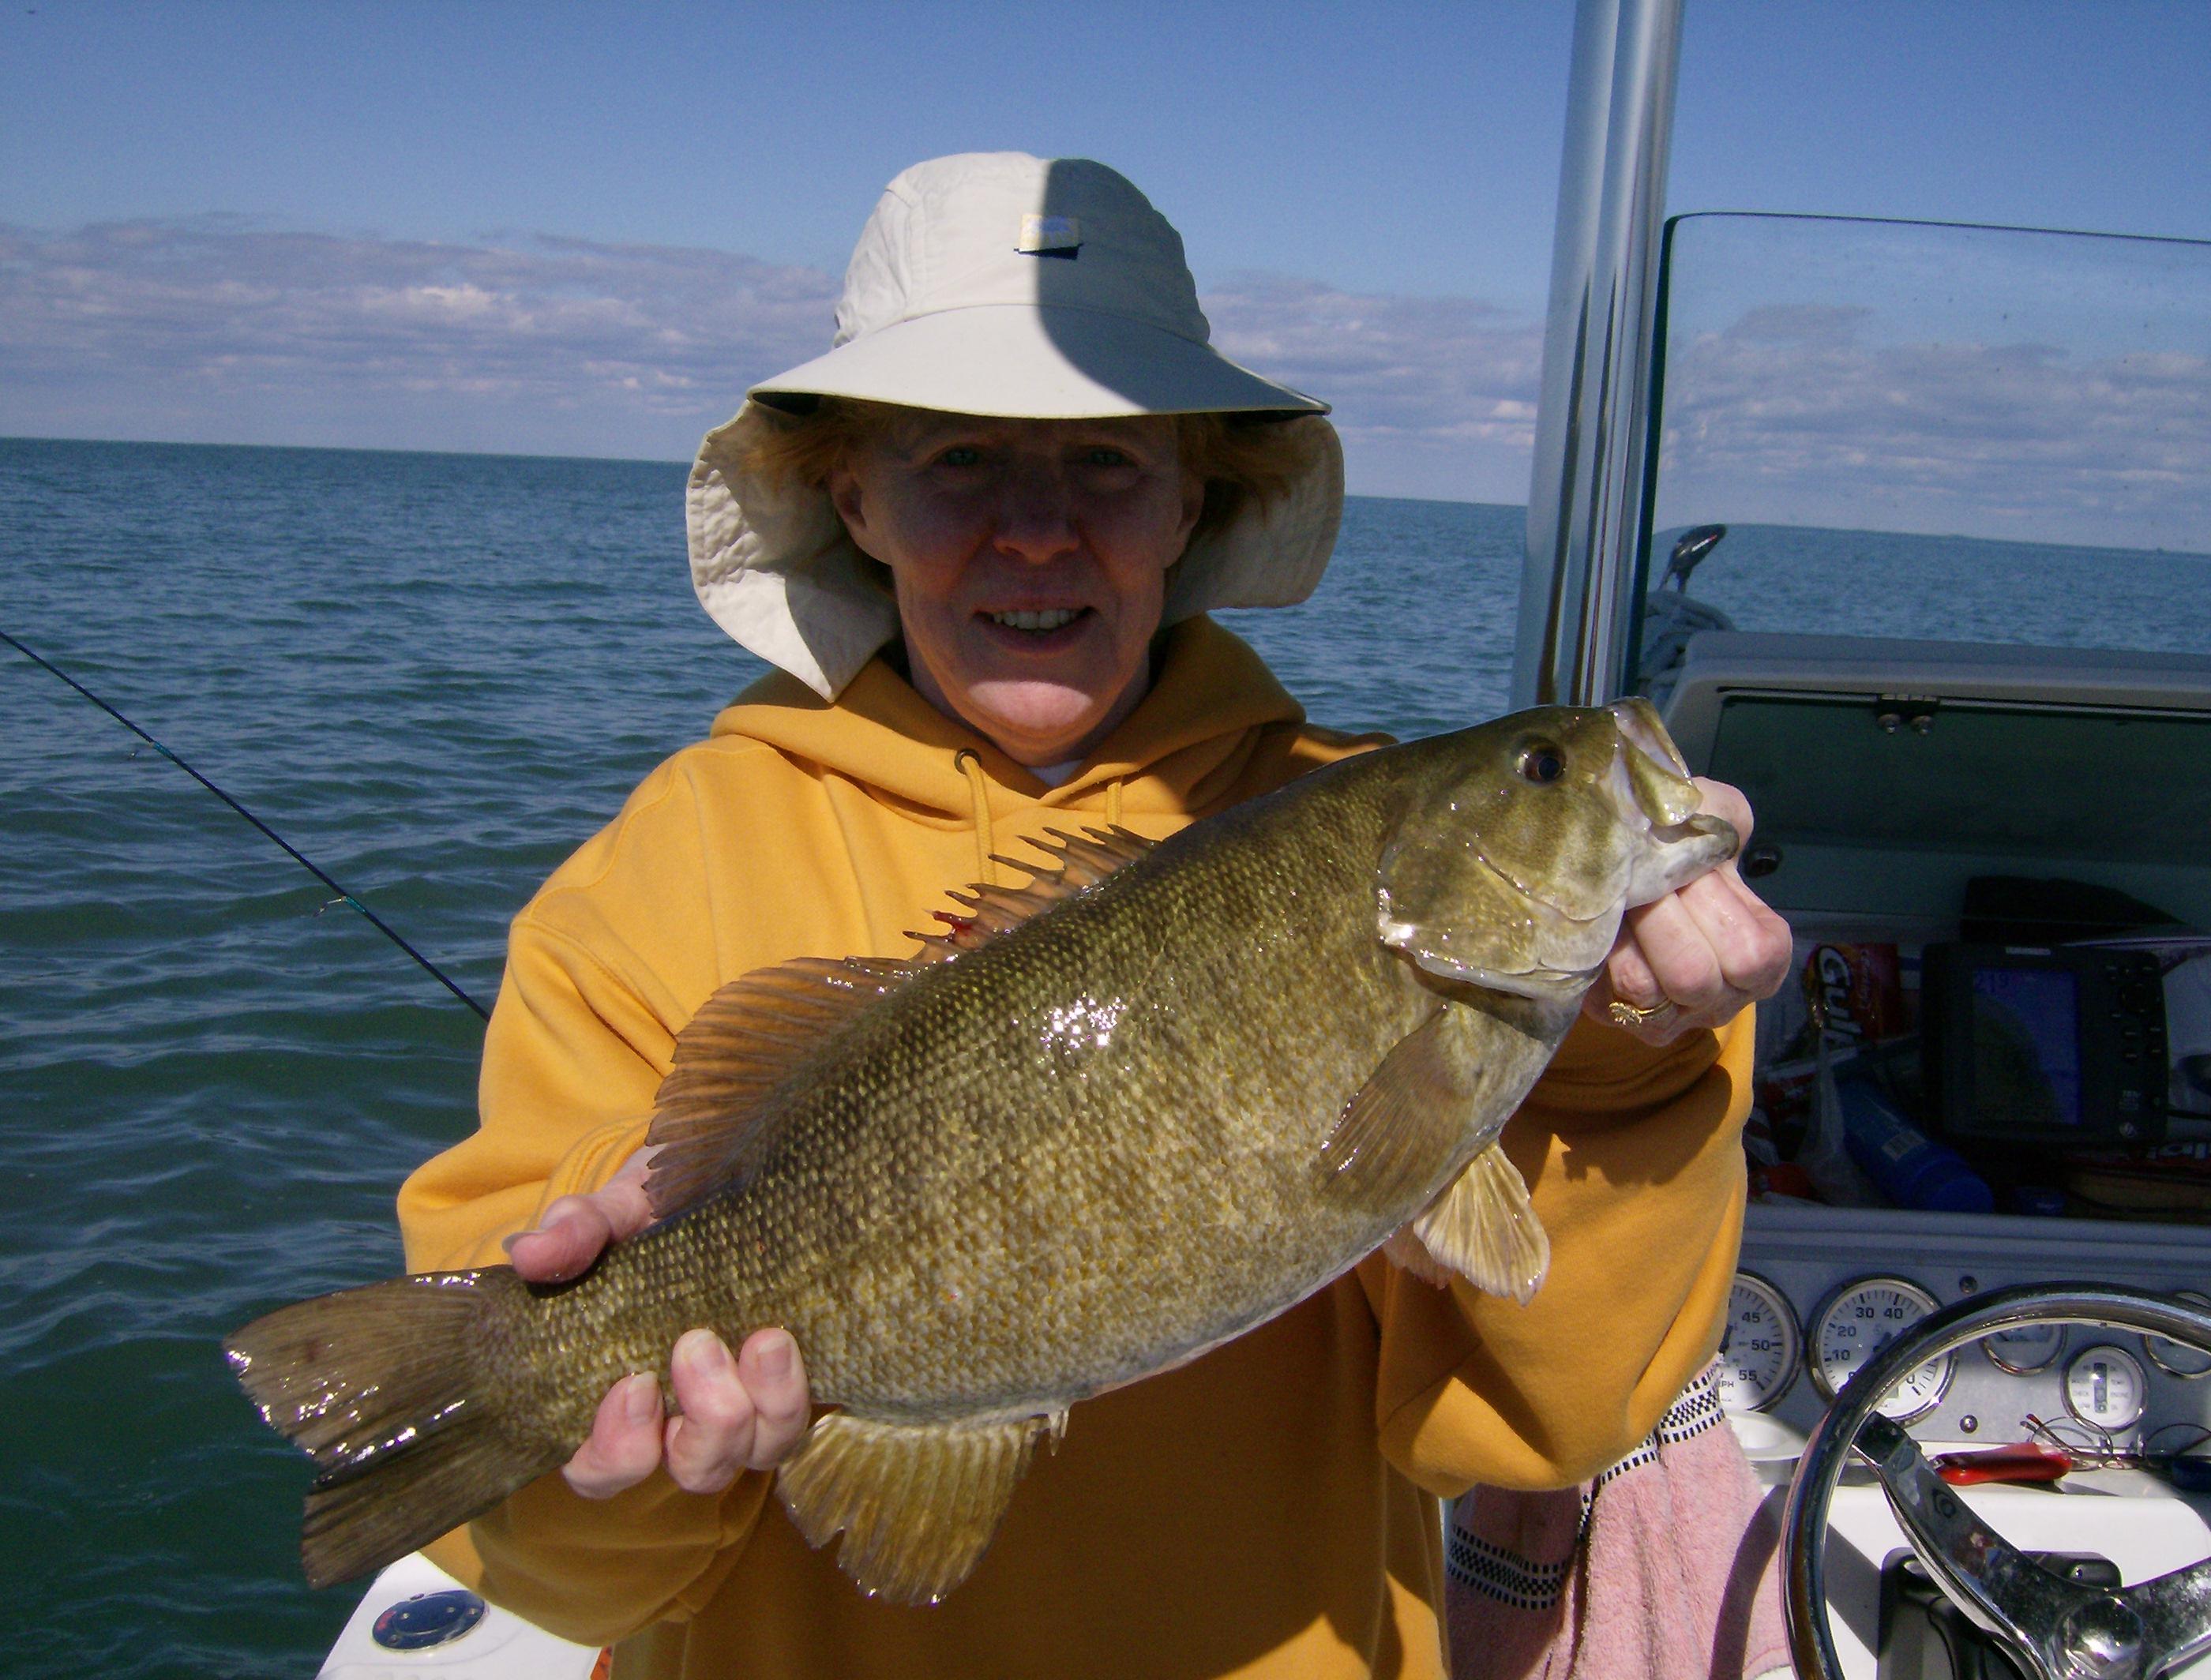 More girl power while fishing on lake erie near buffalo for Best bass fishing near me